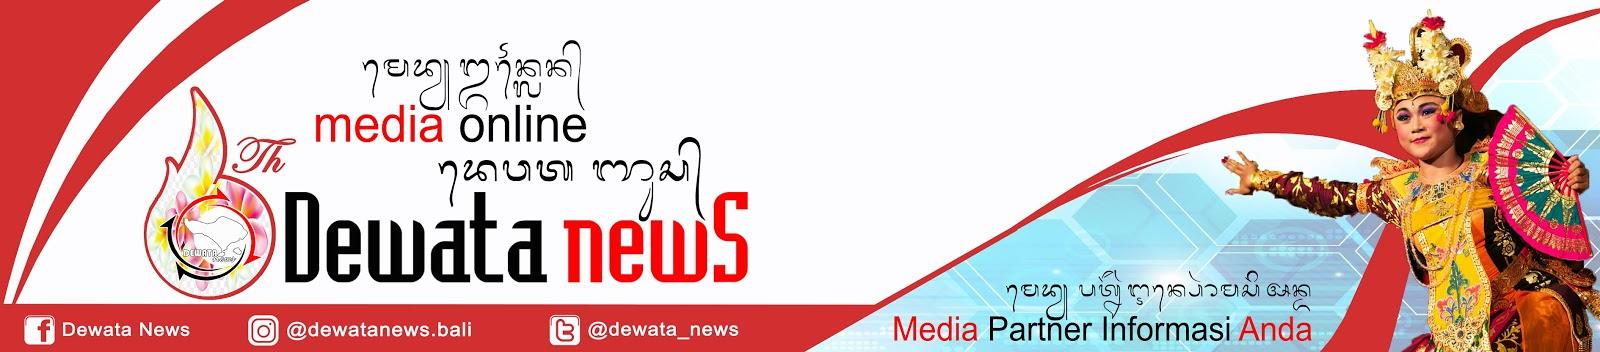 Dewata News